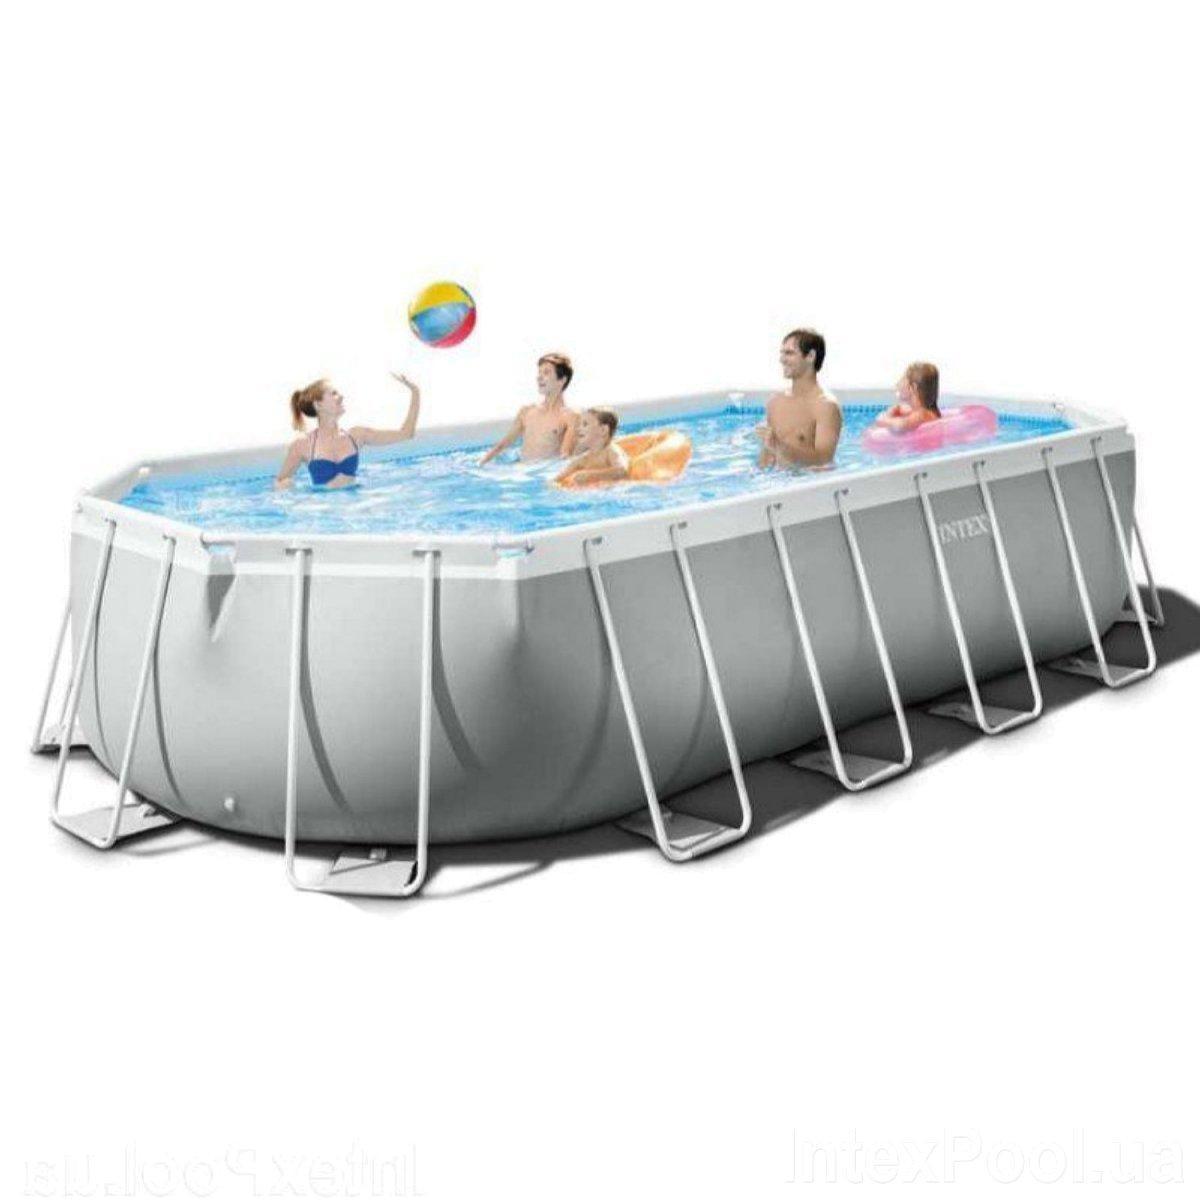 Каркасный бассейн Intex 26798 - 0, 610 x 305 x 122 см